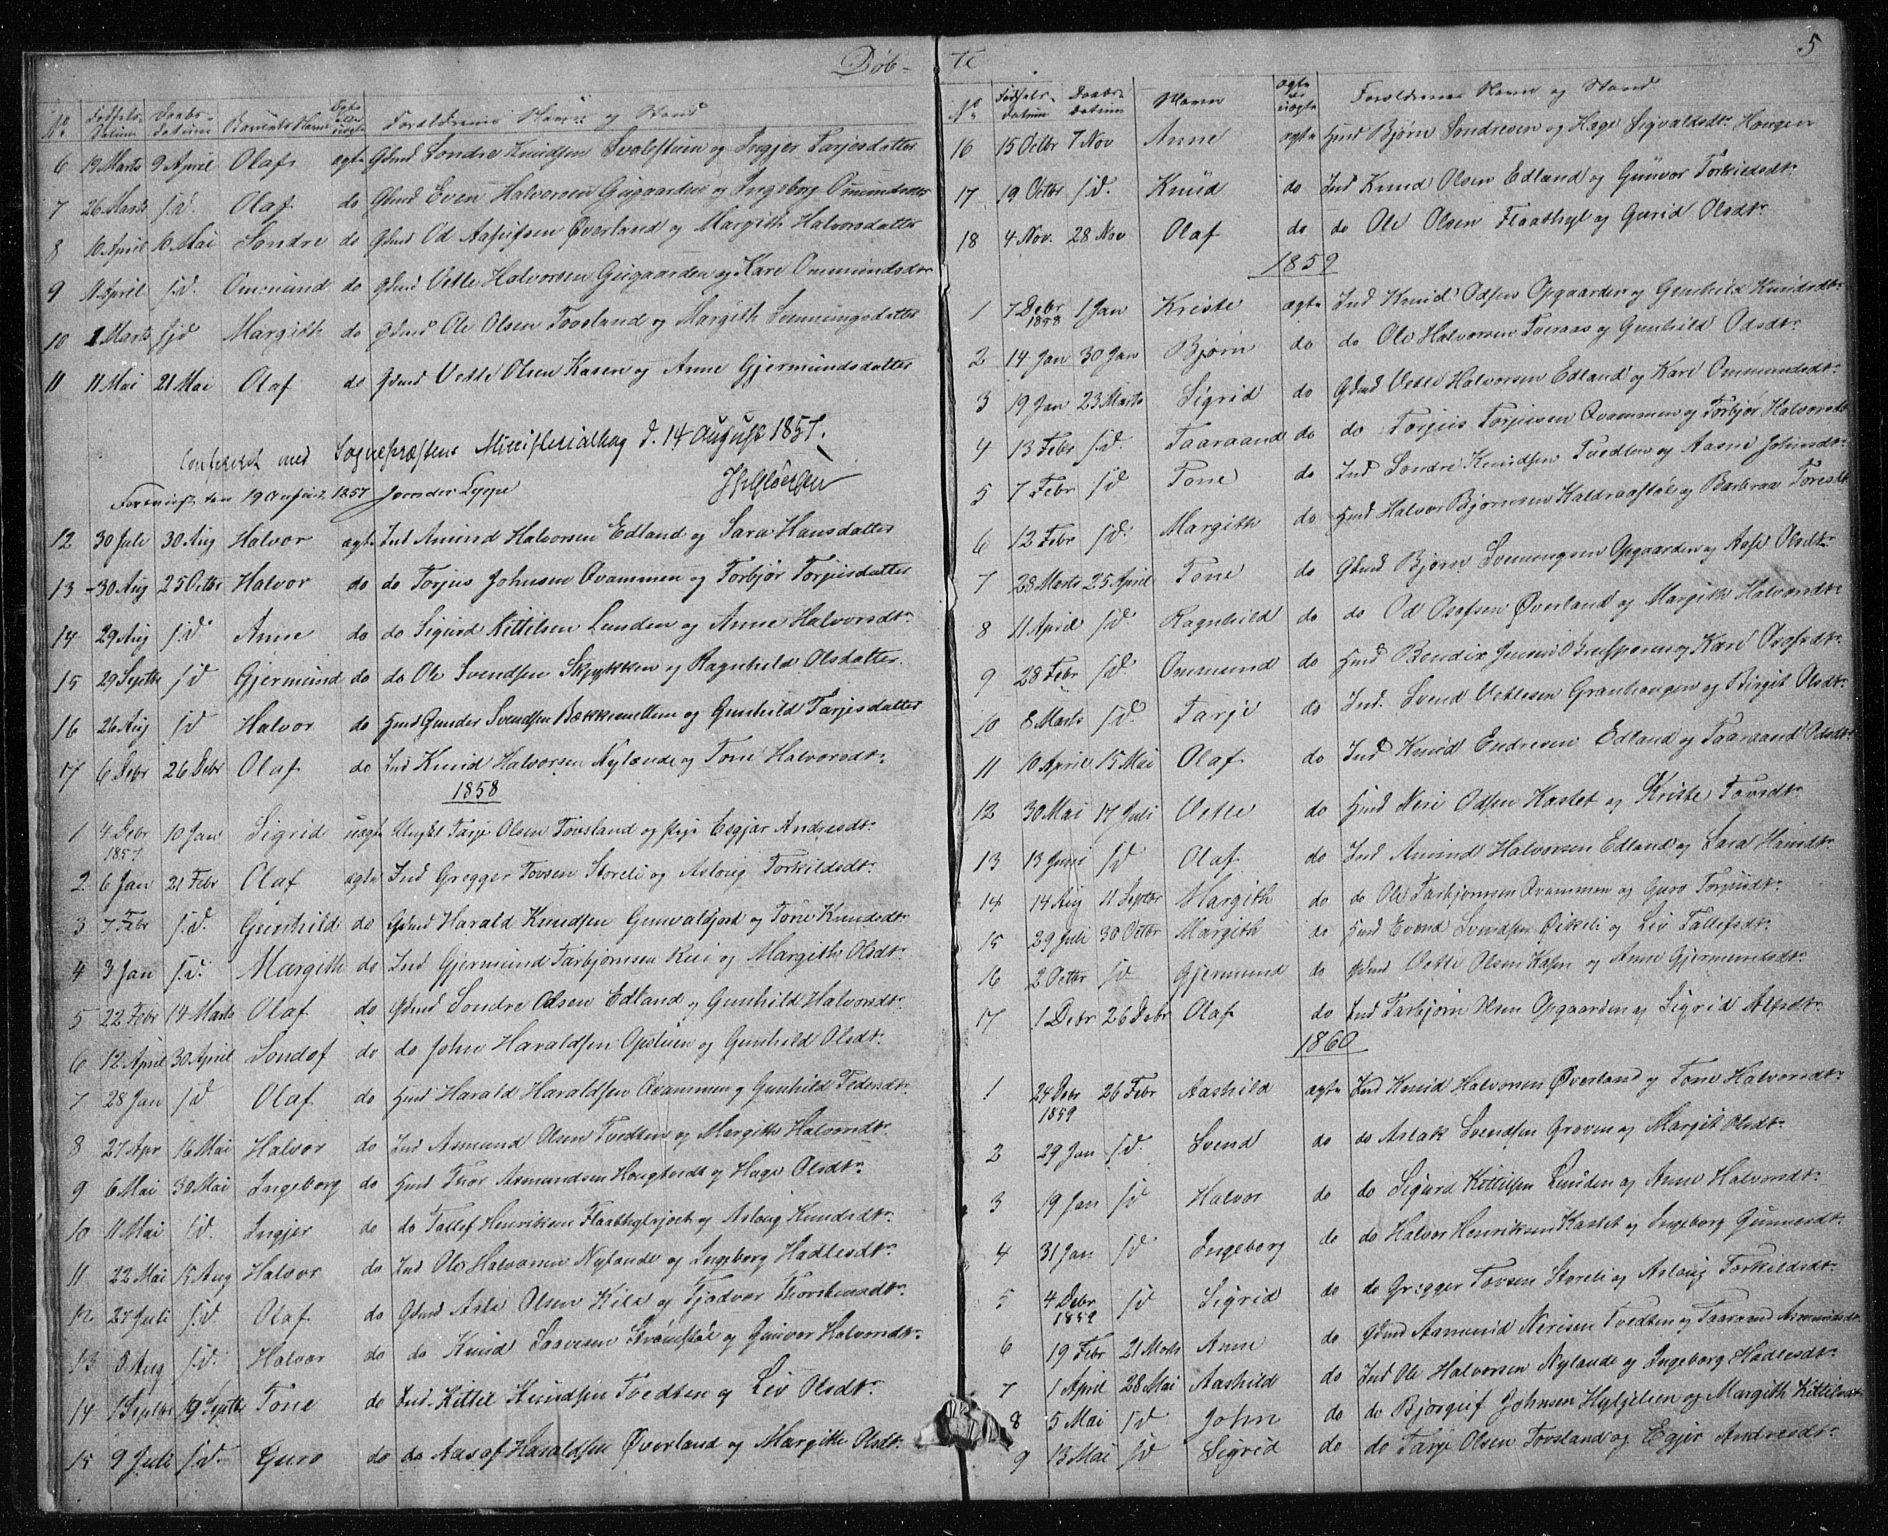 SAKO, Vinje kirkebøker, G/Gc/L0001: Klokkerbok nr. III 1, 1850-1893, s. 5